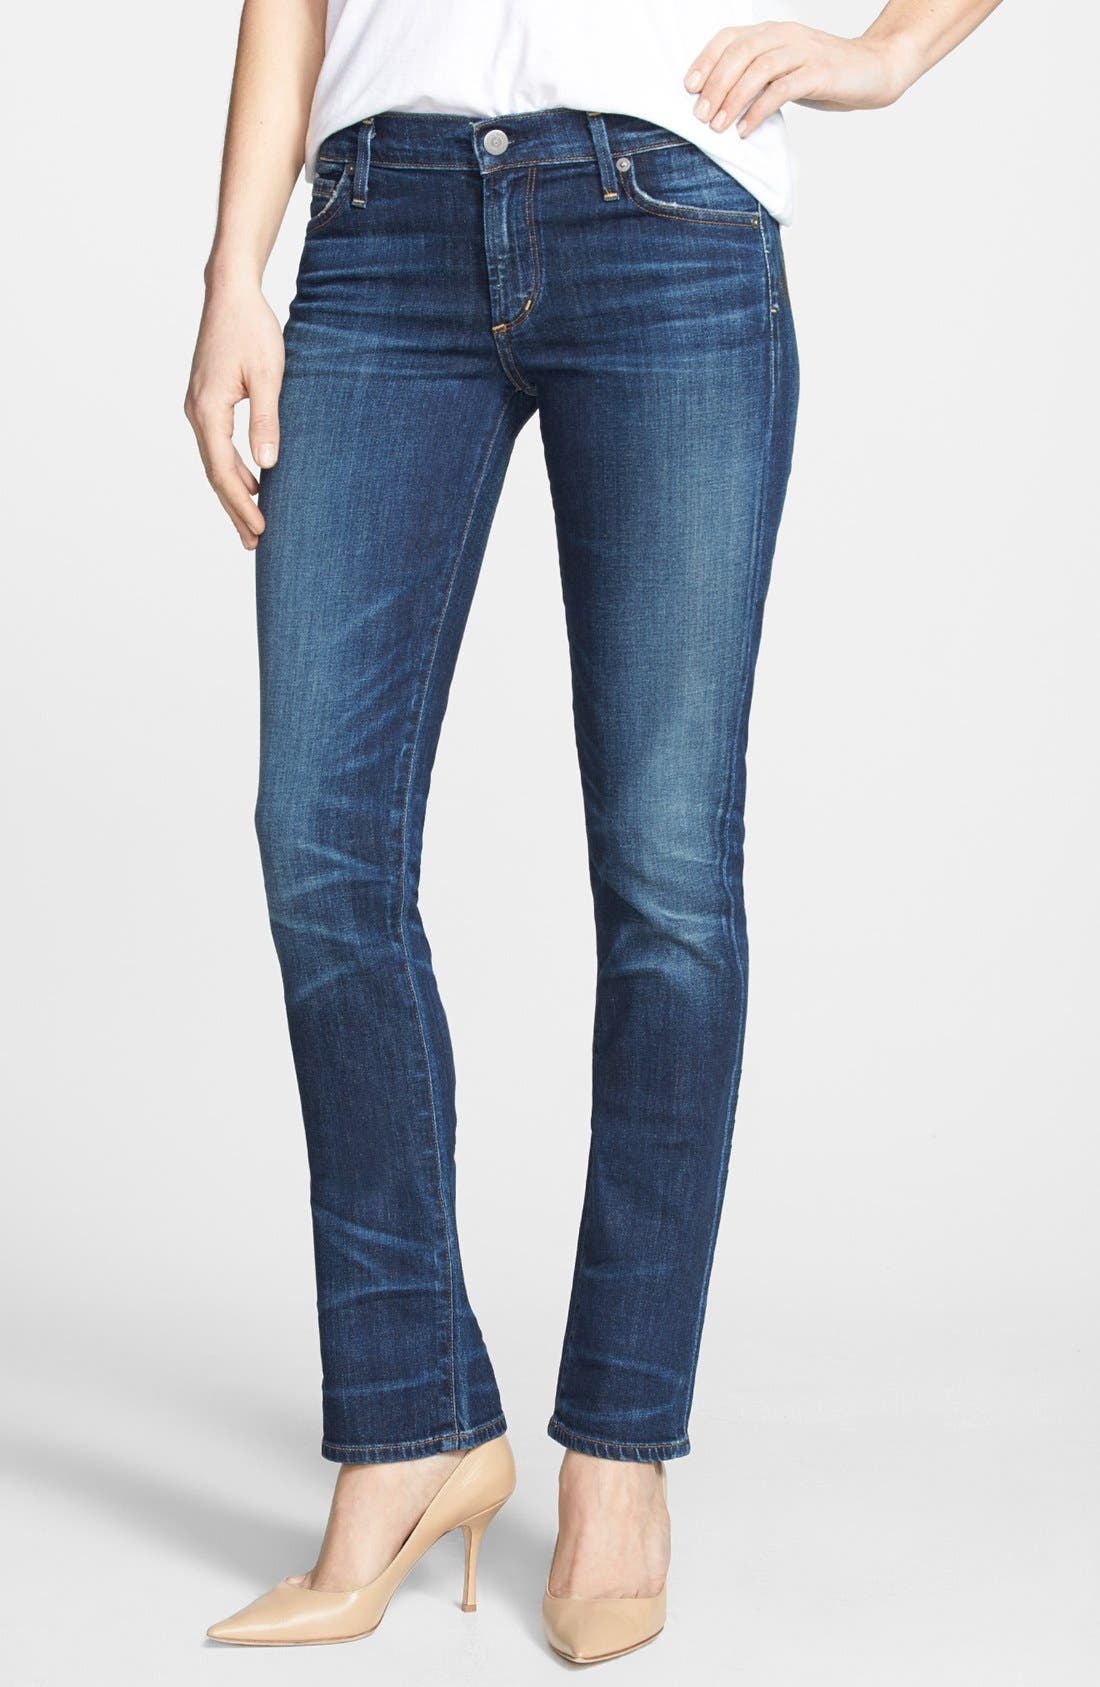 Main Image - Citizens of Humanity 'Ava' Straight Leg Jeans (Patina)